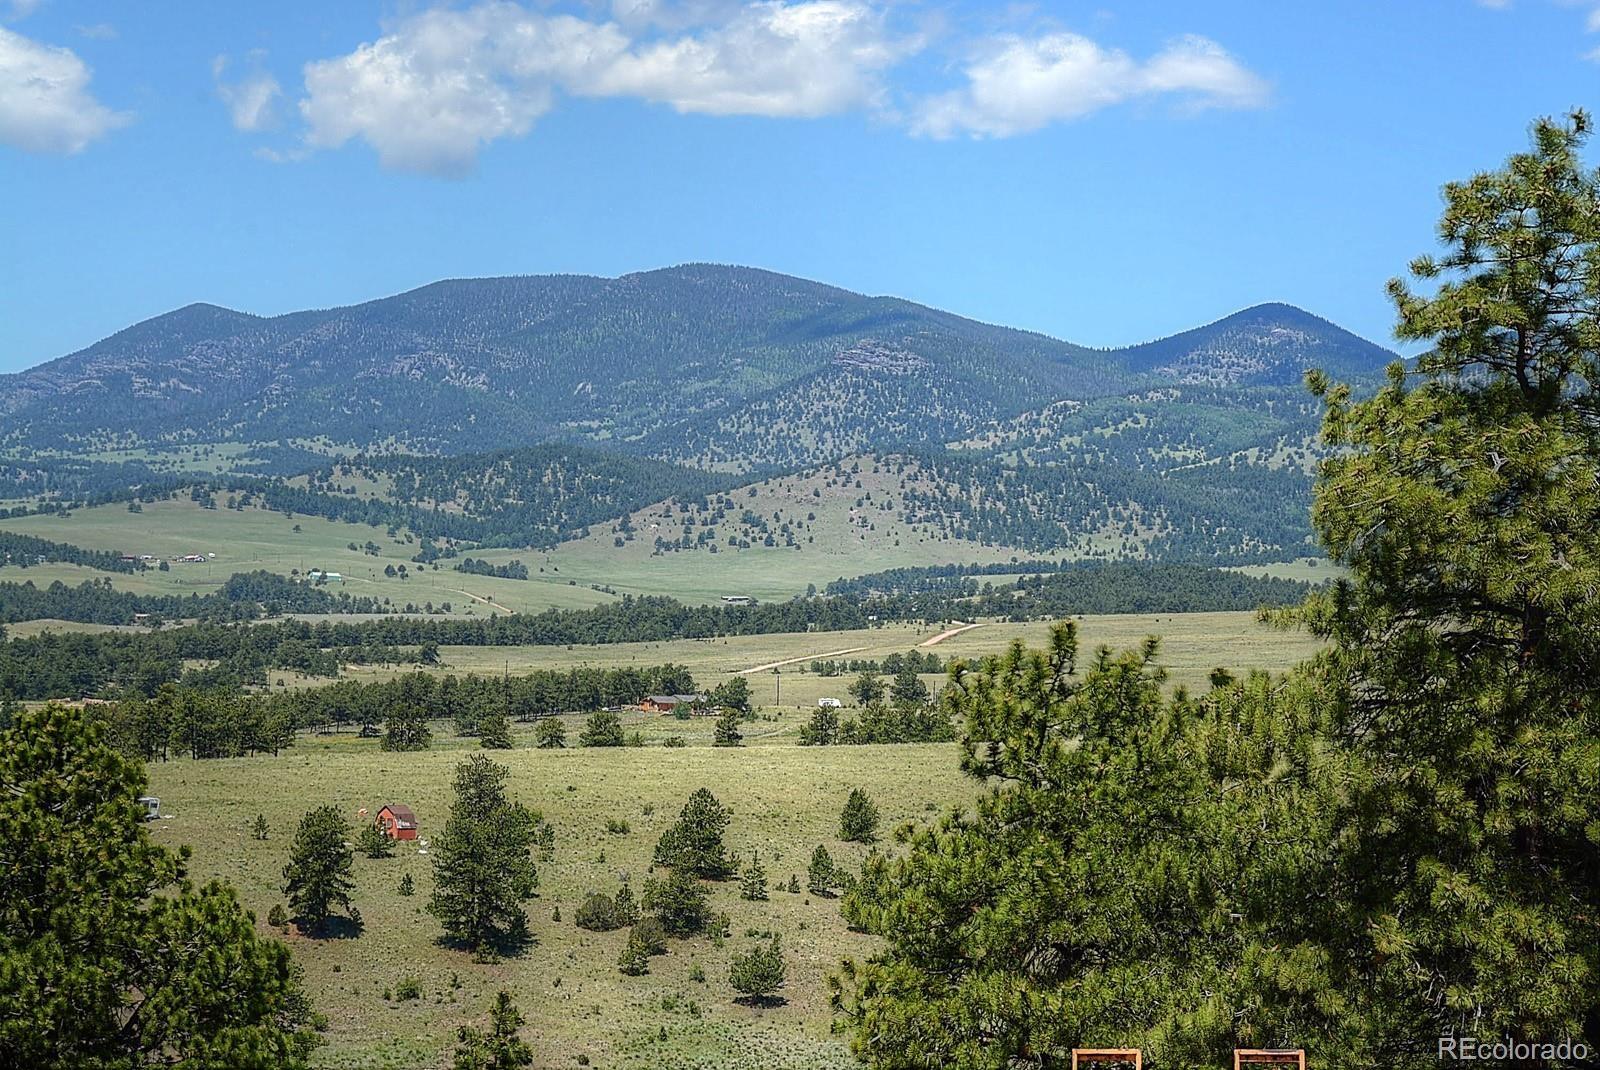 MLS# 8182693 - 3 - 396 Eagle Nest Trail, Guffey, CO 80820